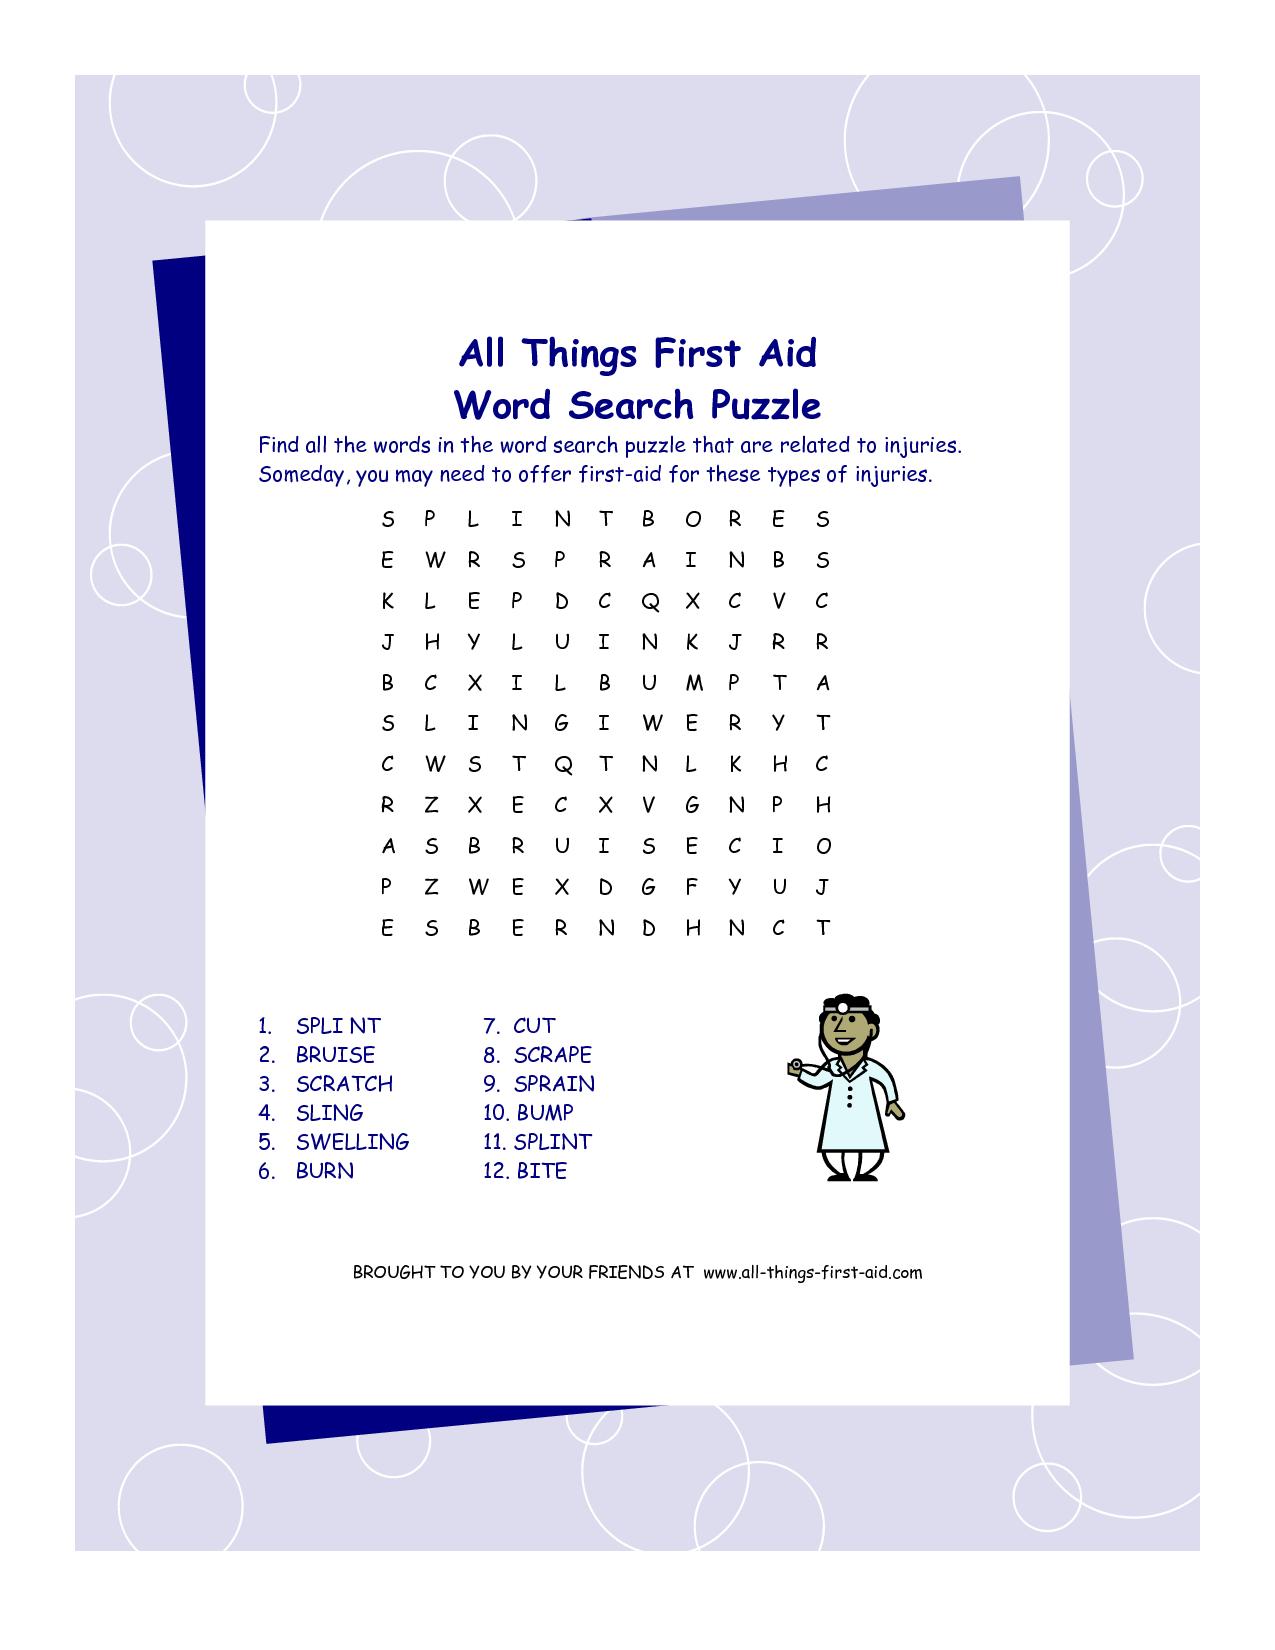 Pin by Meghan Harrington-Patton on Aid | Pinterest | Word search ...